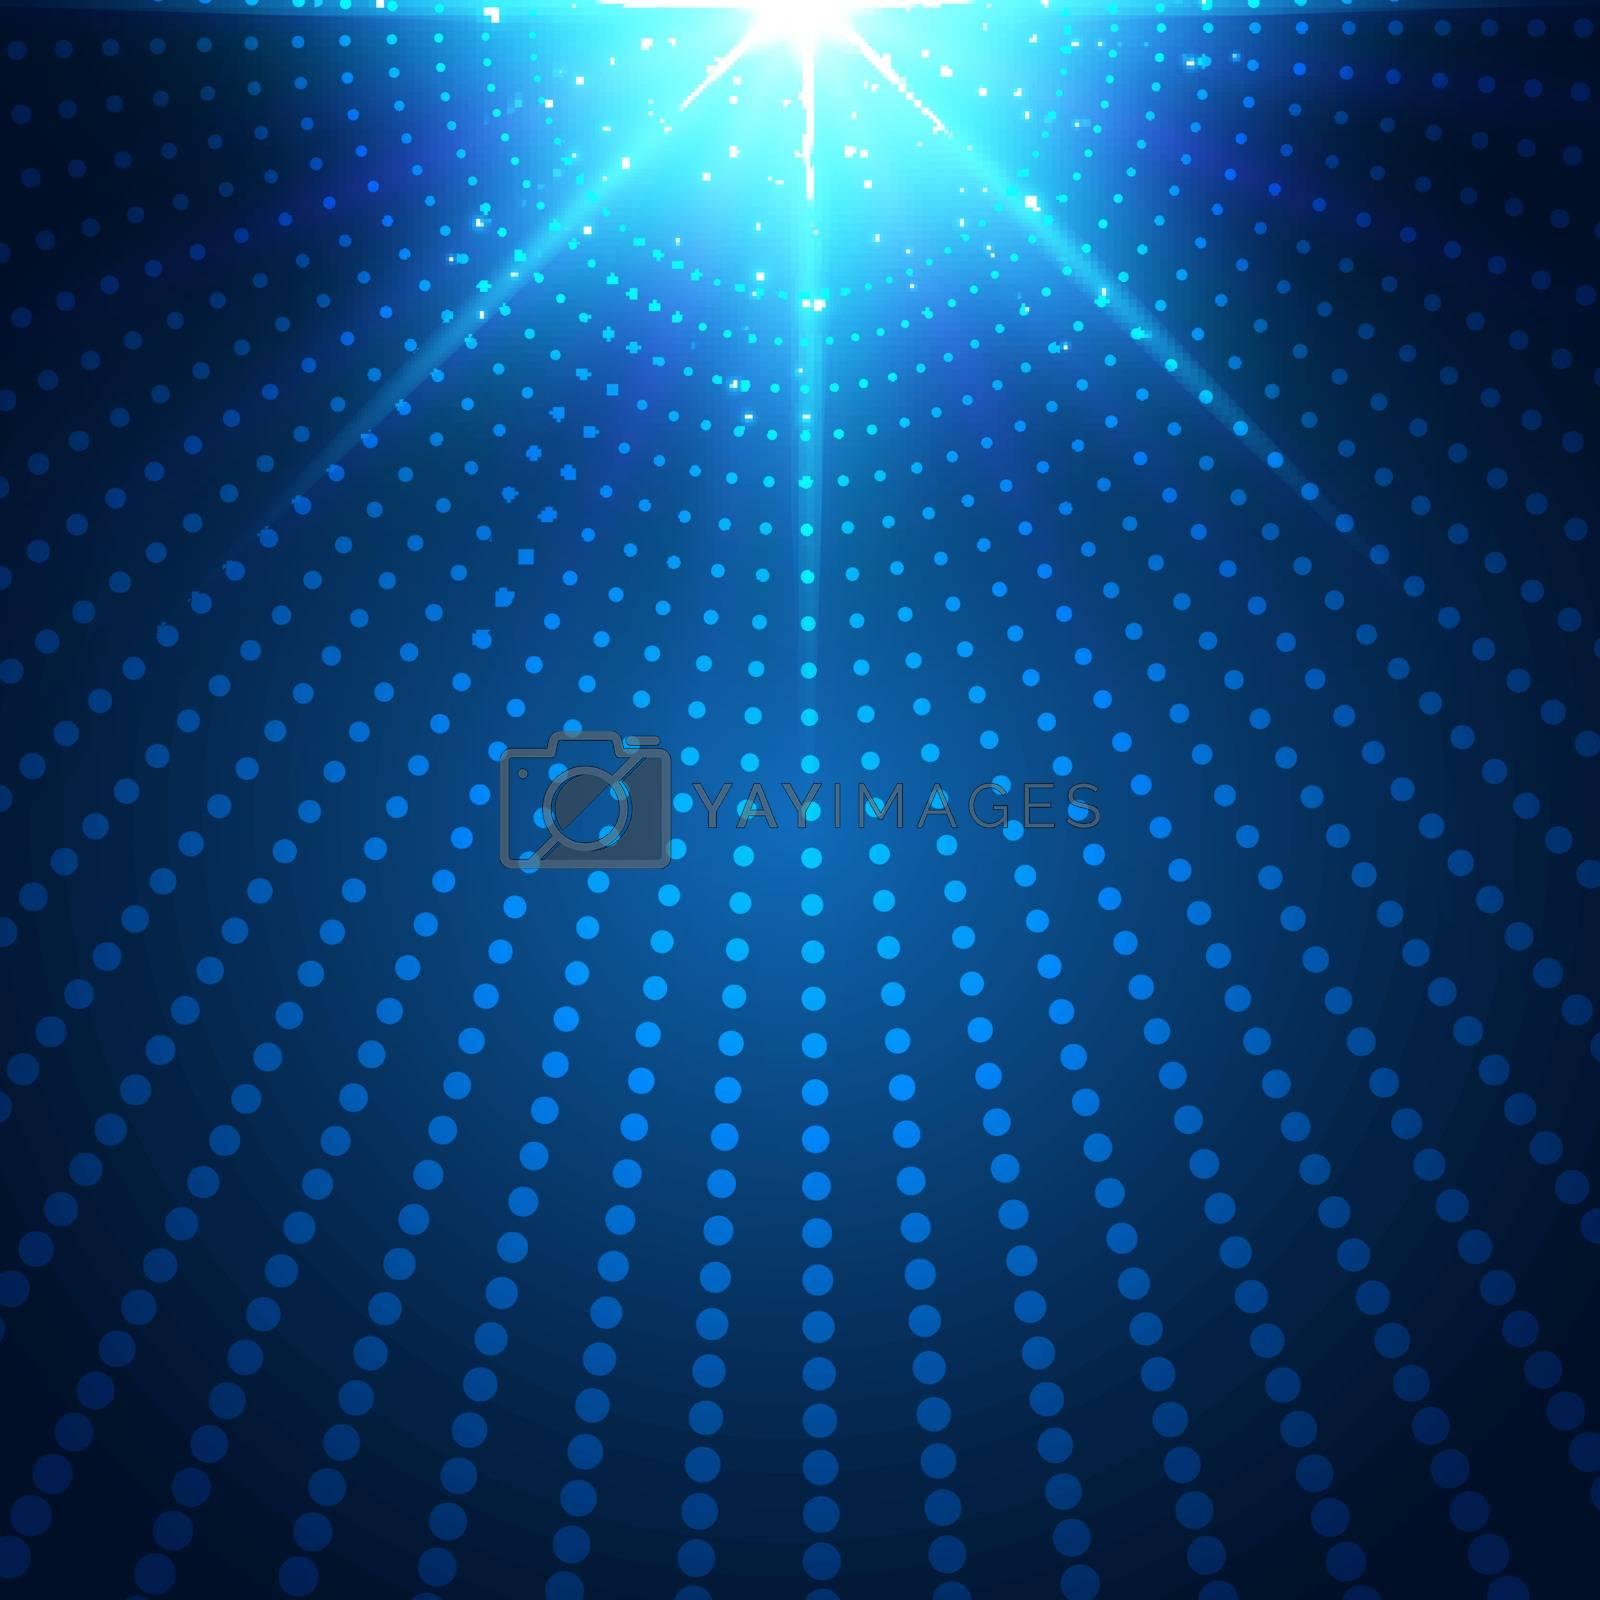 Abstract technology futuristic blue neon radial light burst effect on dark background. Digital elements circles halftone. Vector illustration